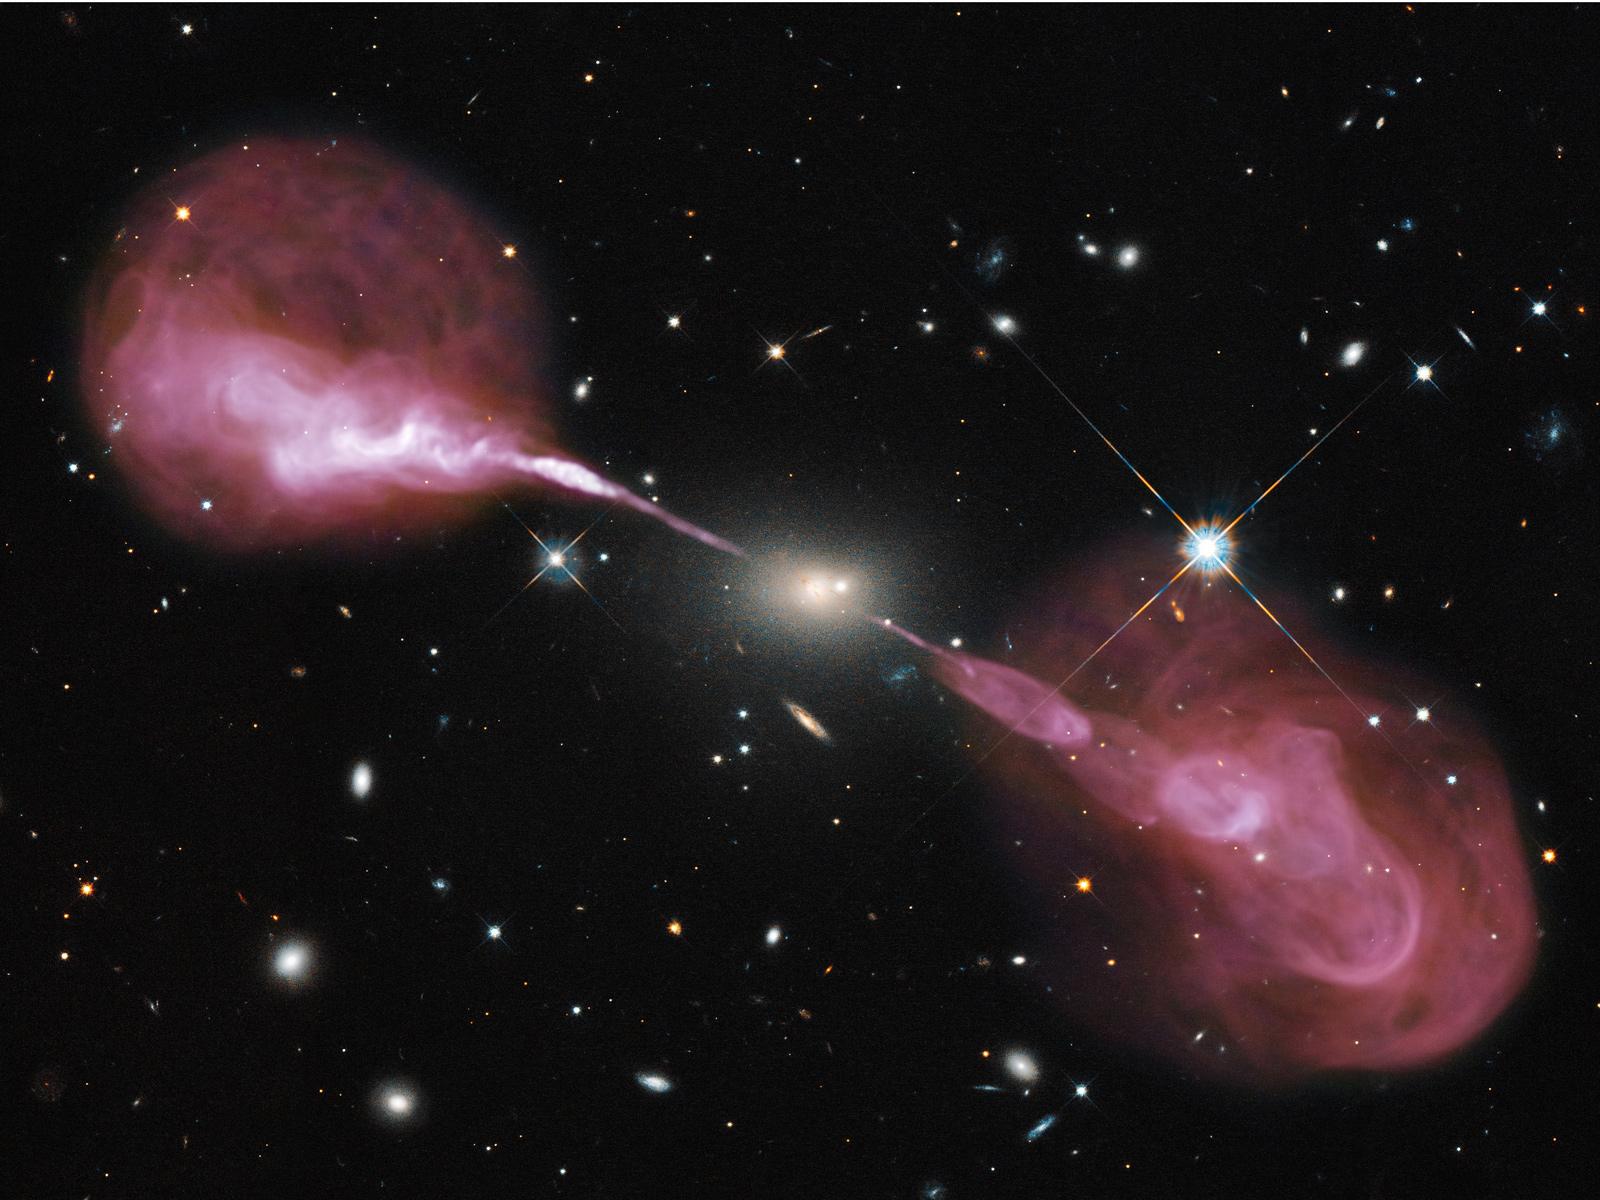 Secrets of a Supermassive Black Hole Revealed | Space Wallpaper